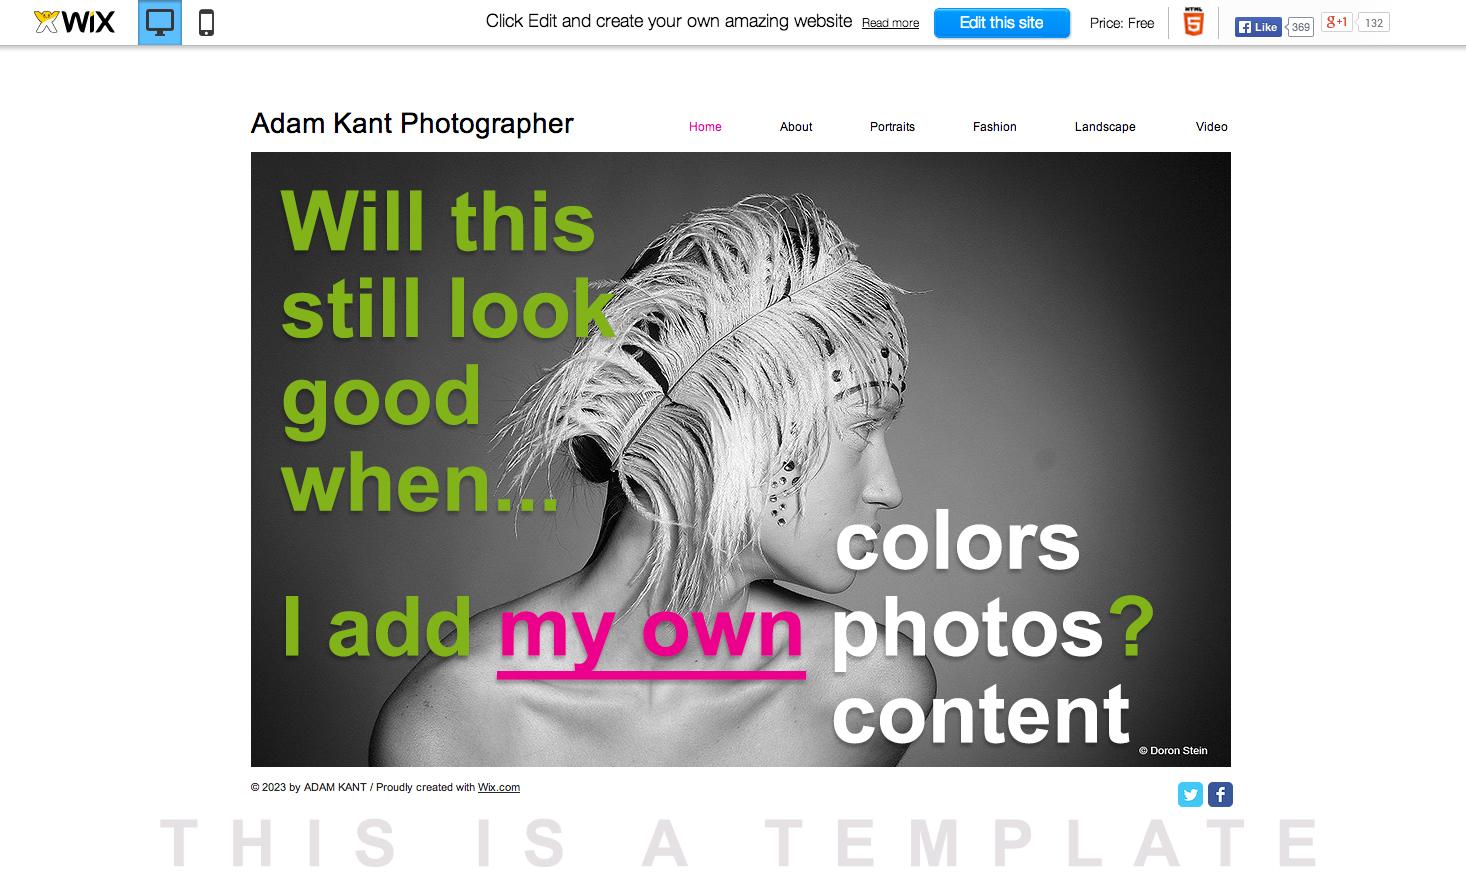 Web Designer Versus Template - Green Ball Media